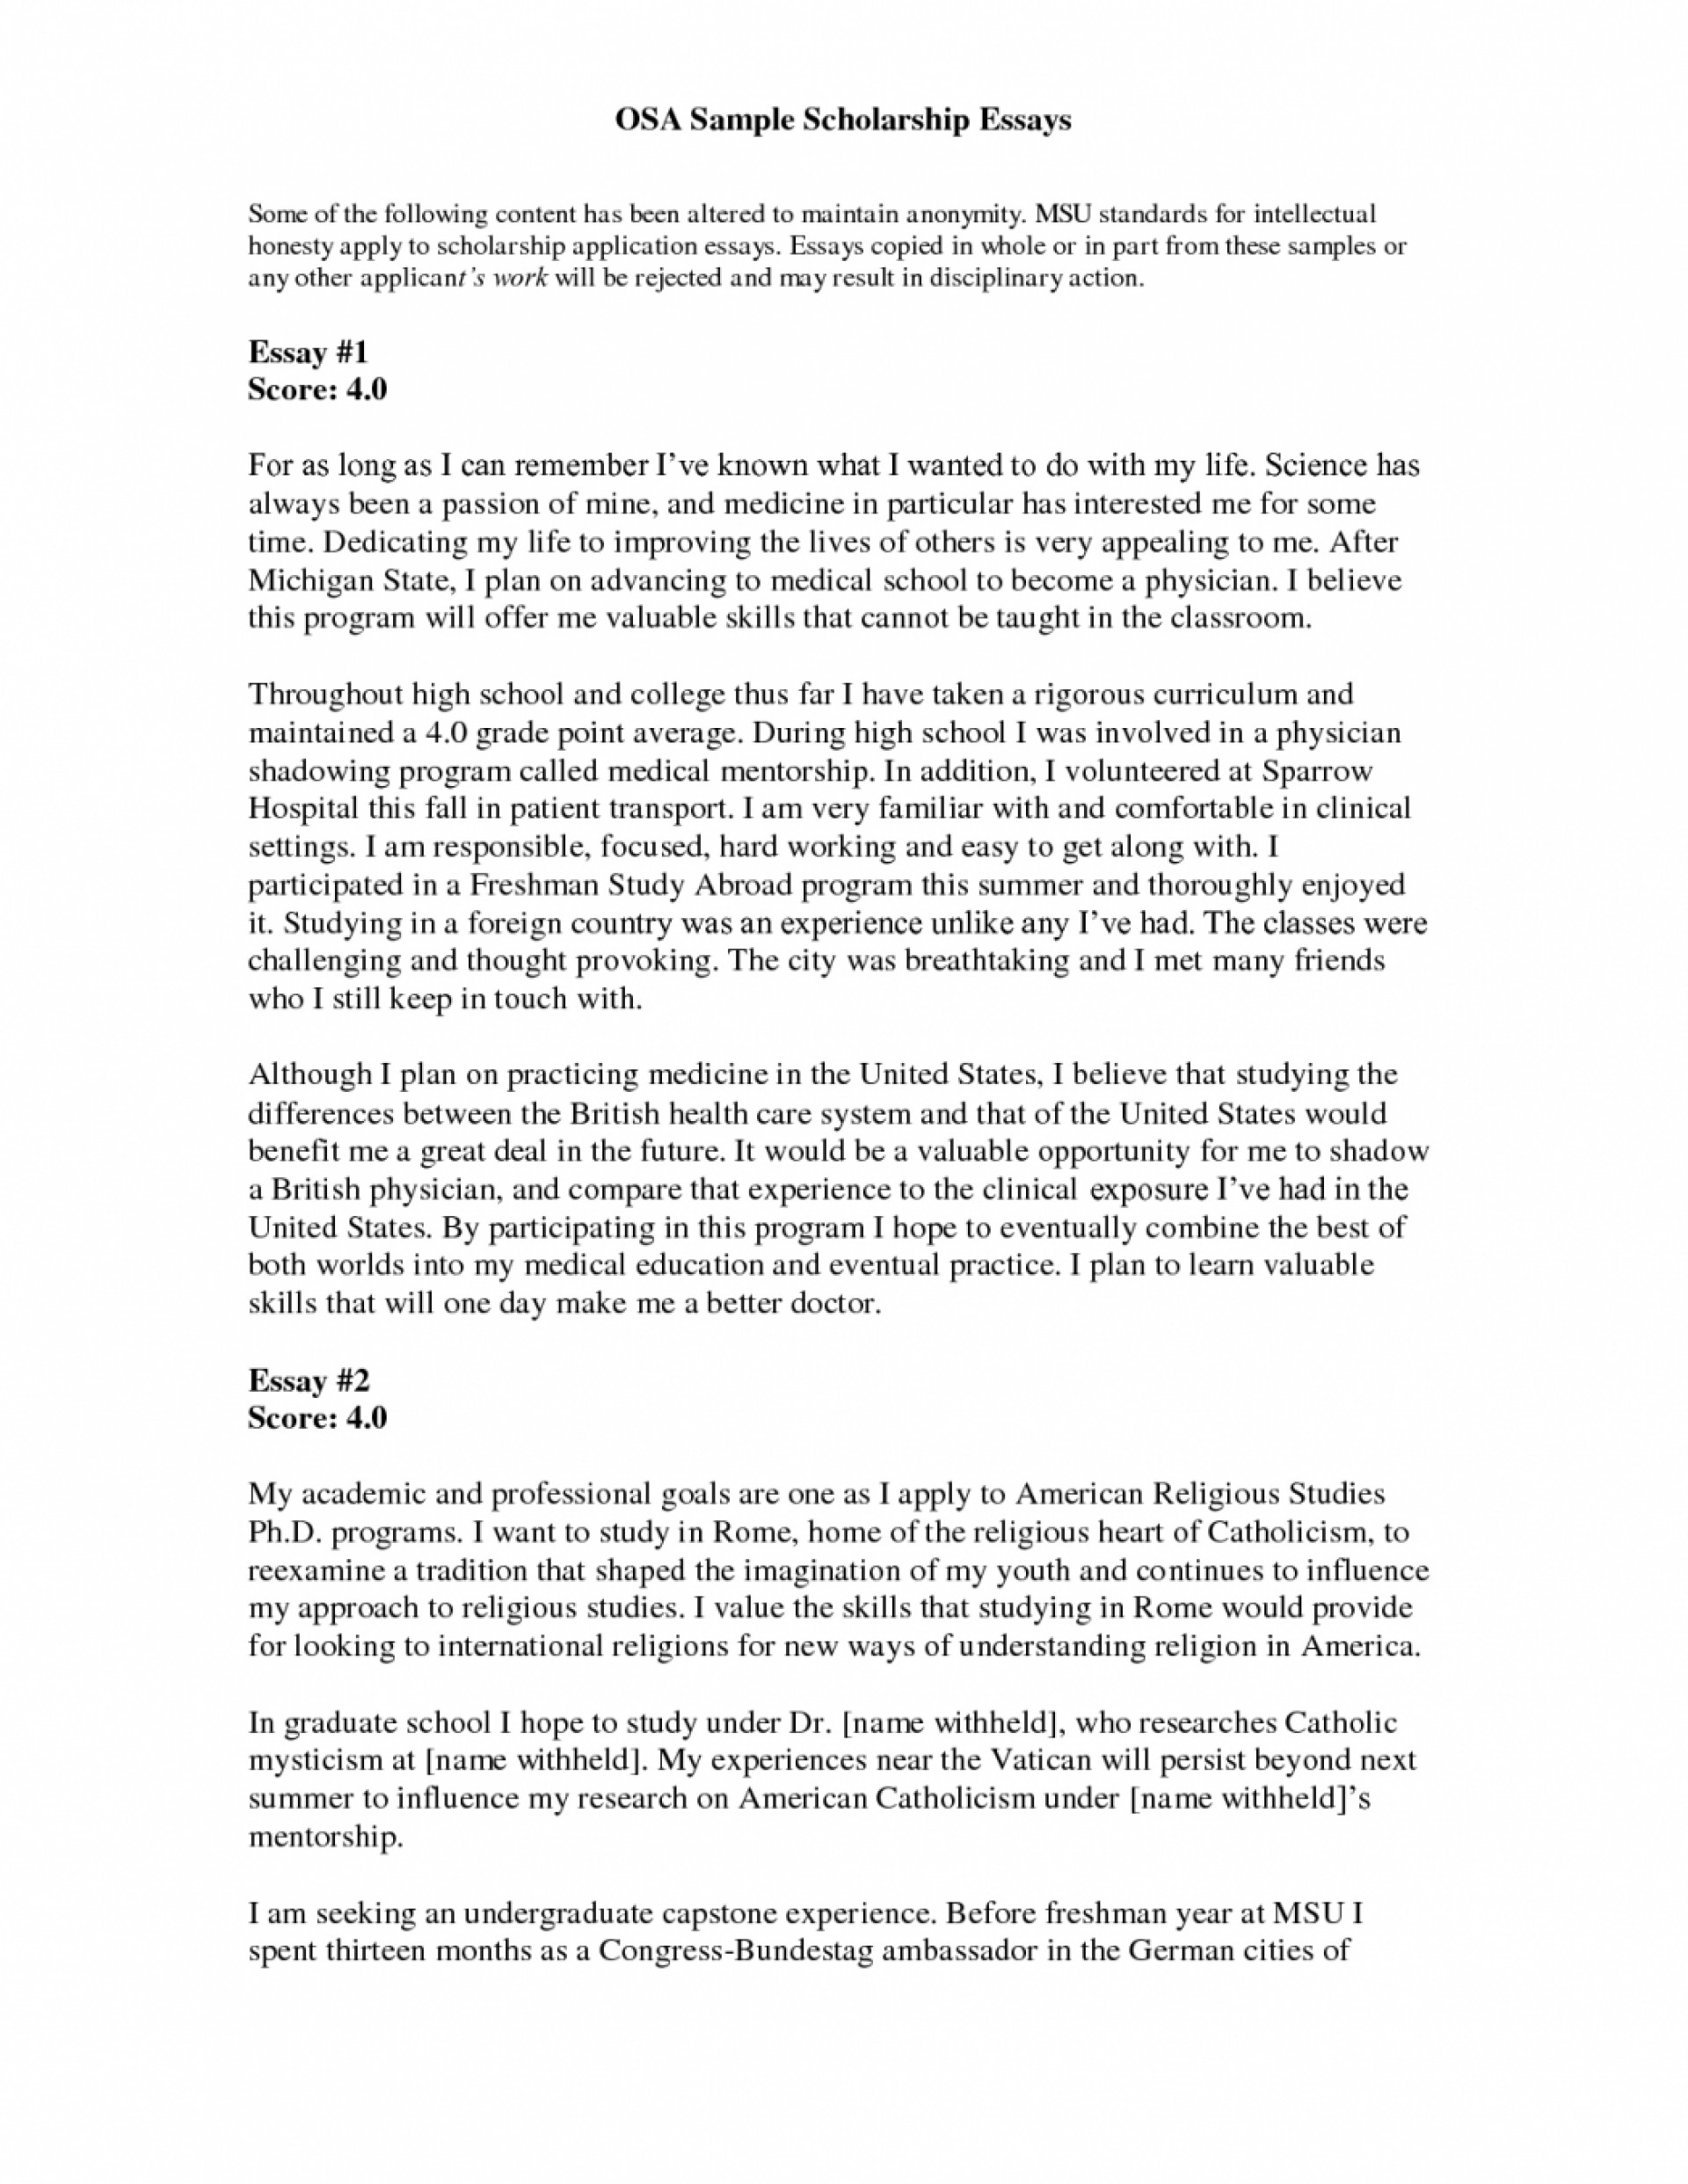 007 Study Abroad Application Essay Essays Examples Scholarships 9axjh Scholarship Example Phenomenal Samples 1920